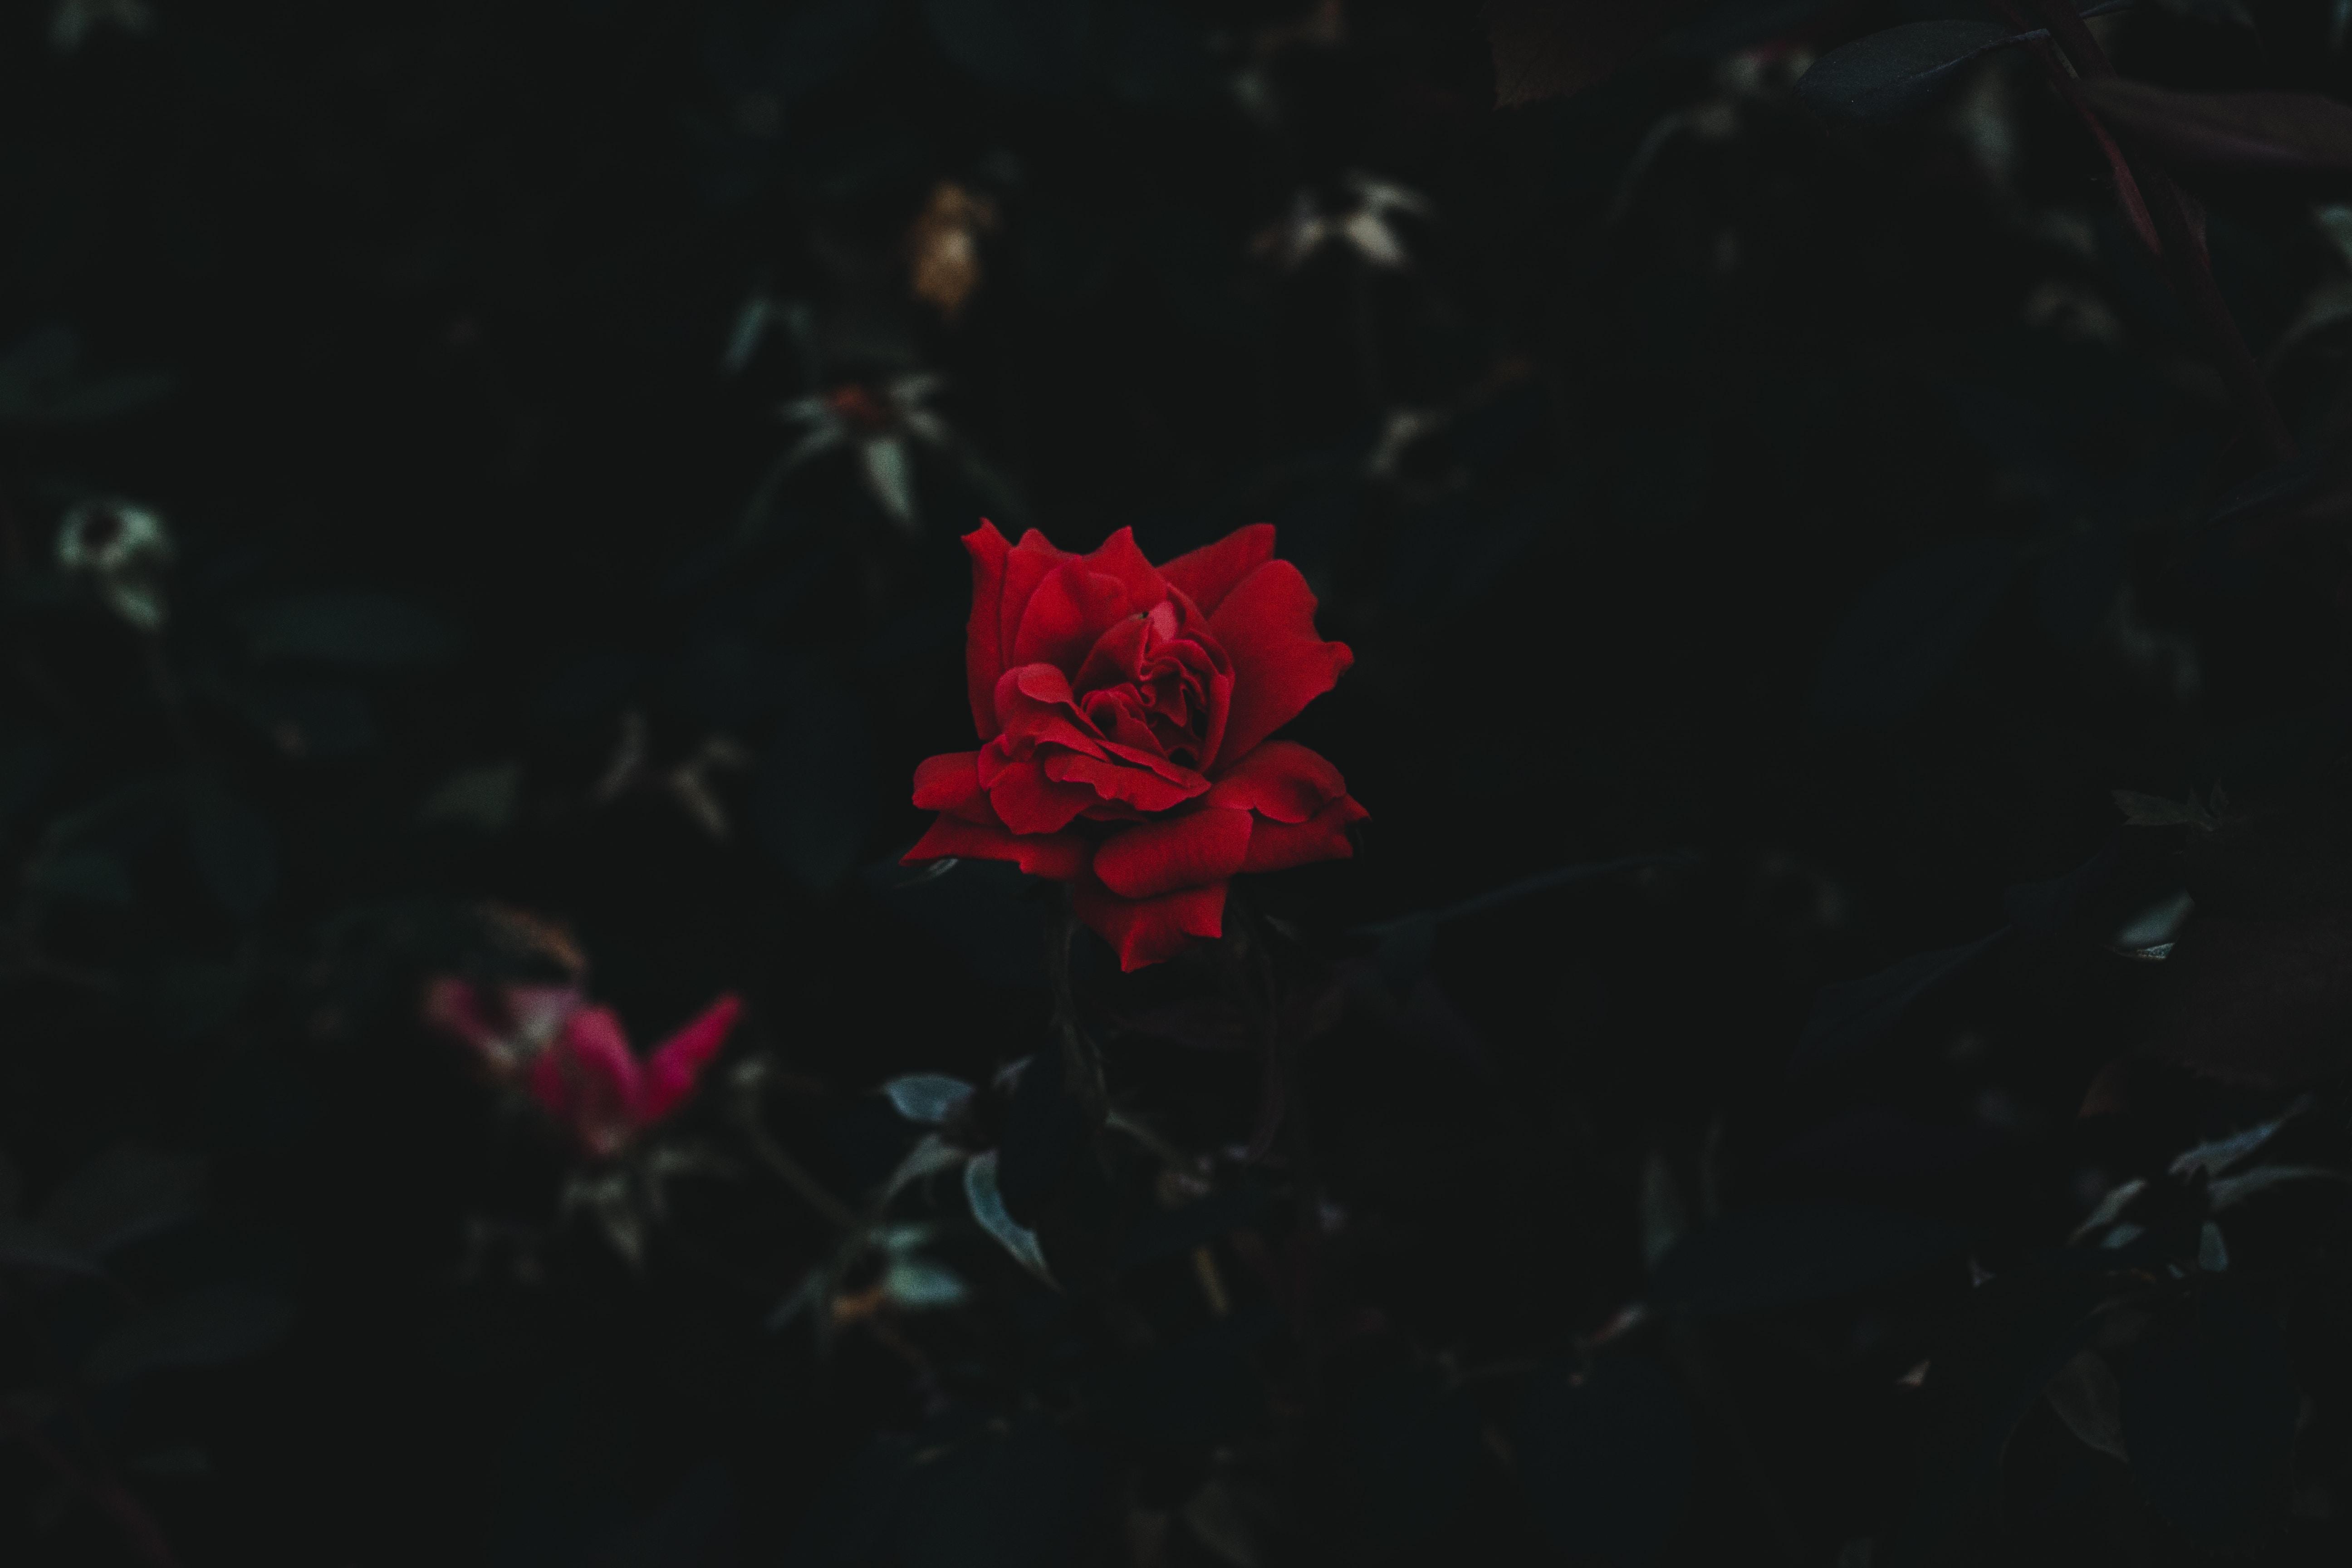 red petaled flower closeup photo